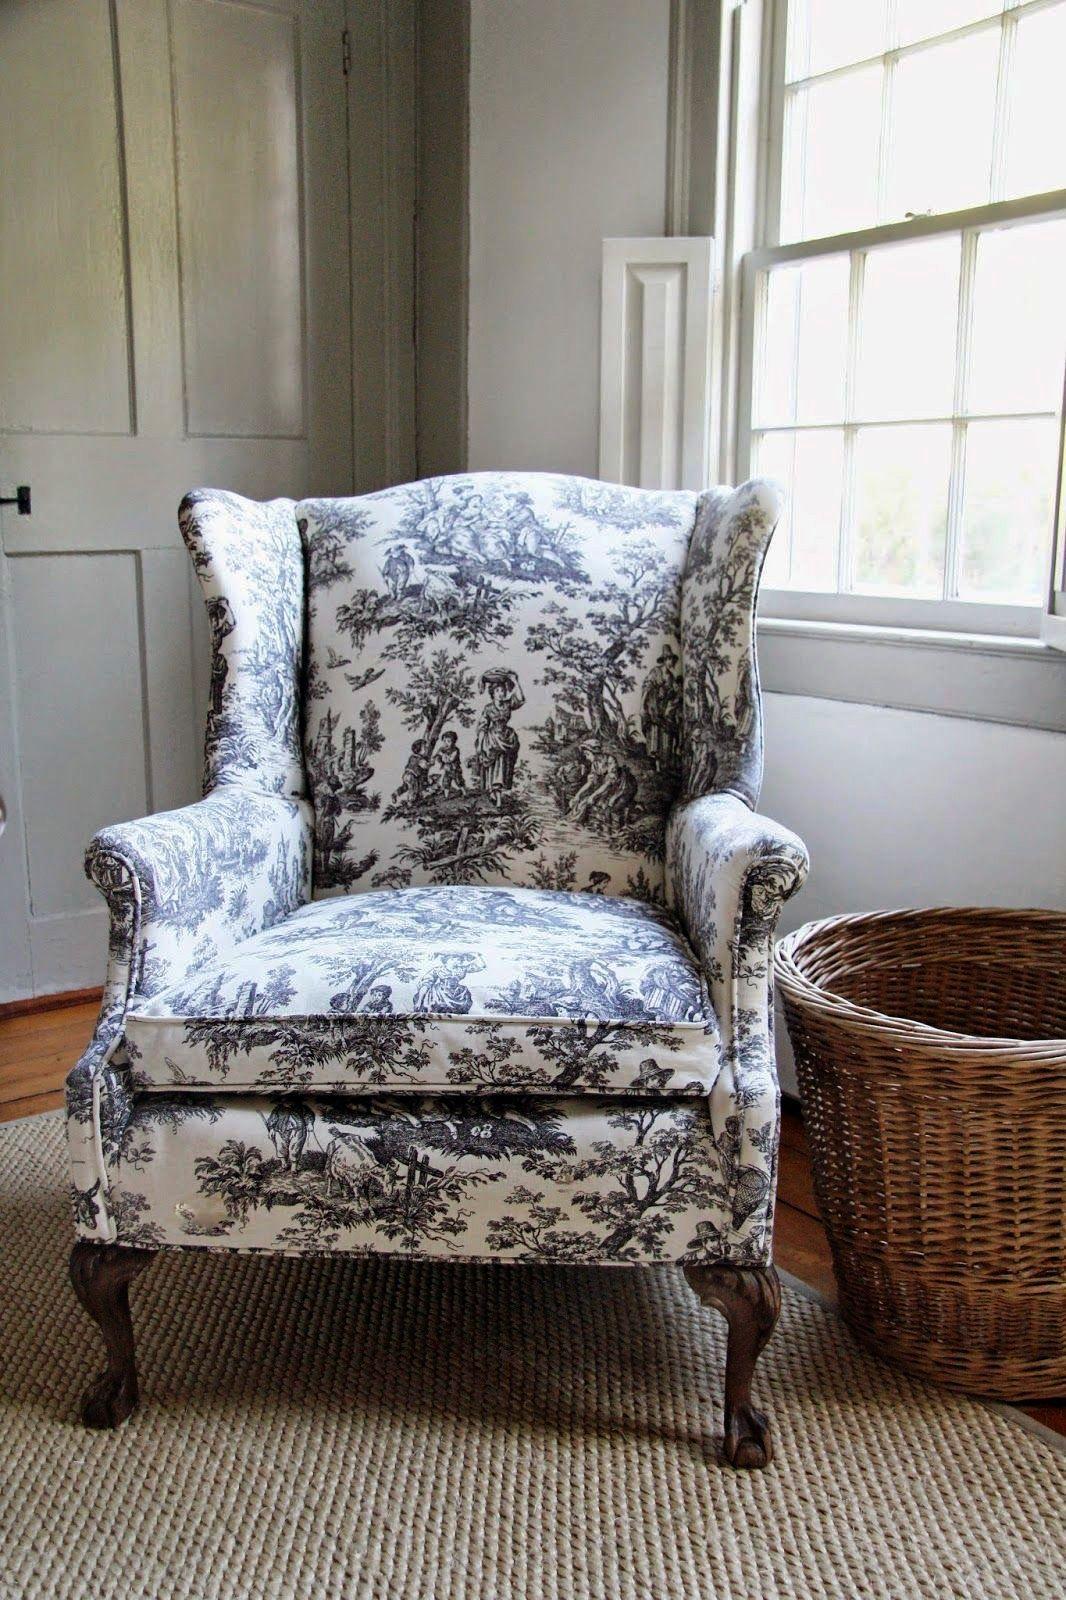 Prime Toile Vintage Noir Et Blanc Toile English Furniture Caraccident5 Cool Chair Designs And Ideas Caraccident5Info